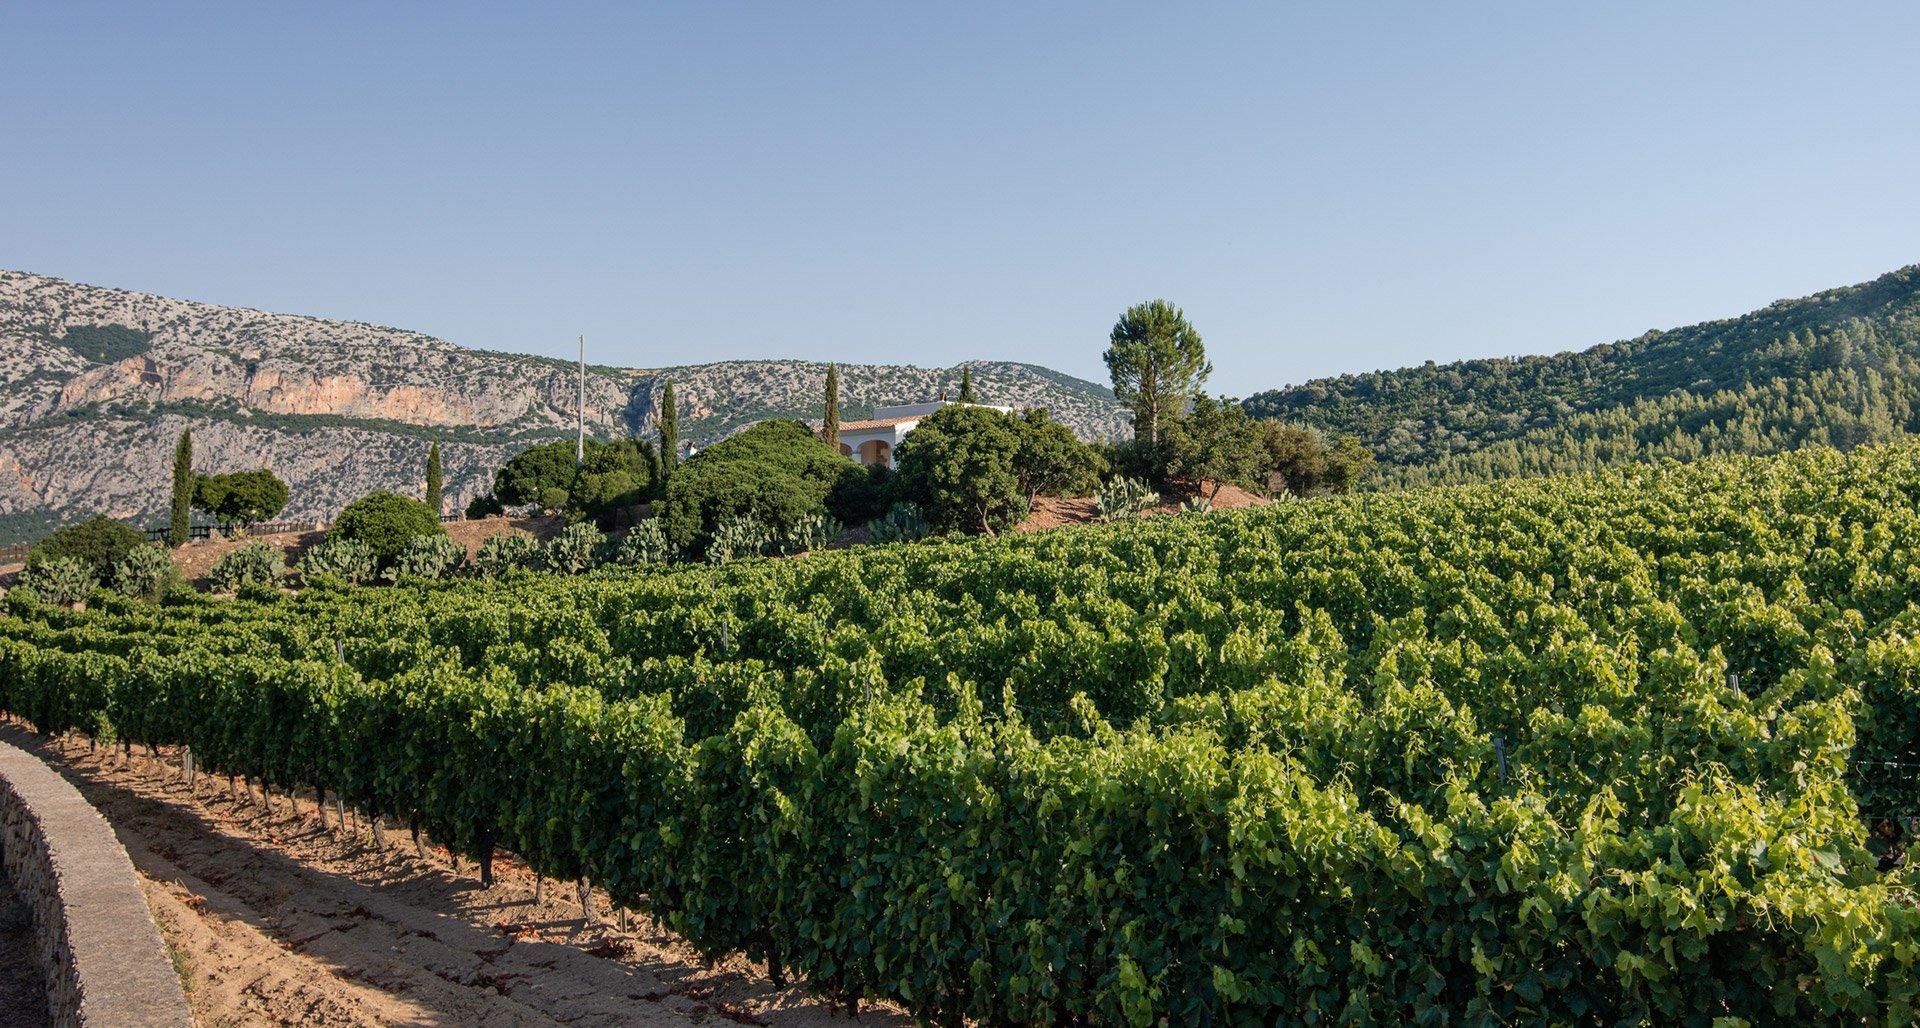 Vineyard Atha Ruja Dorgali Sardinia